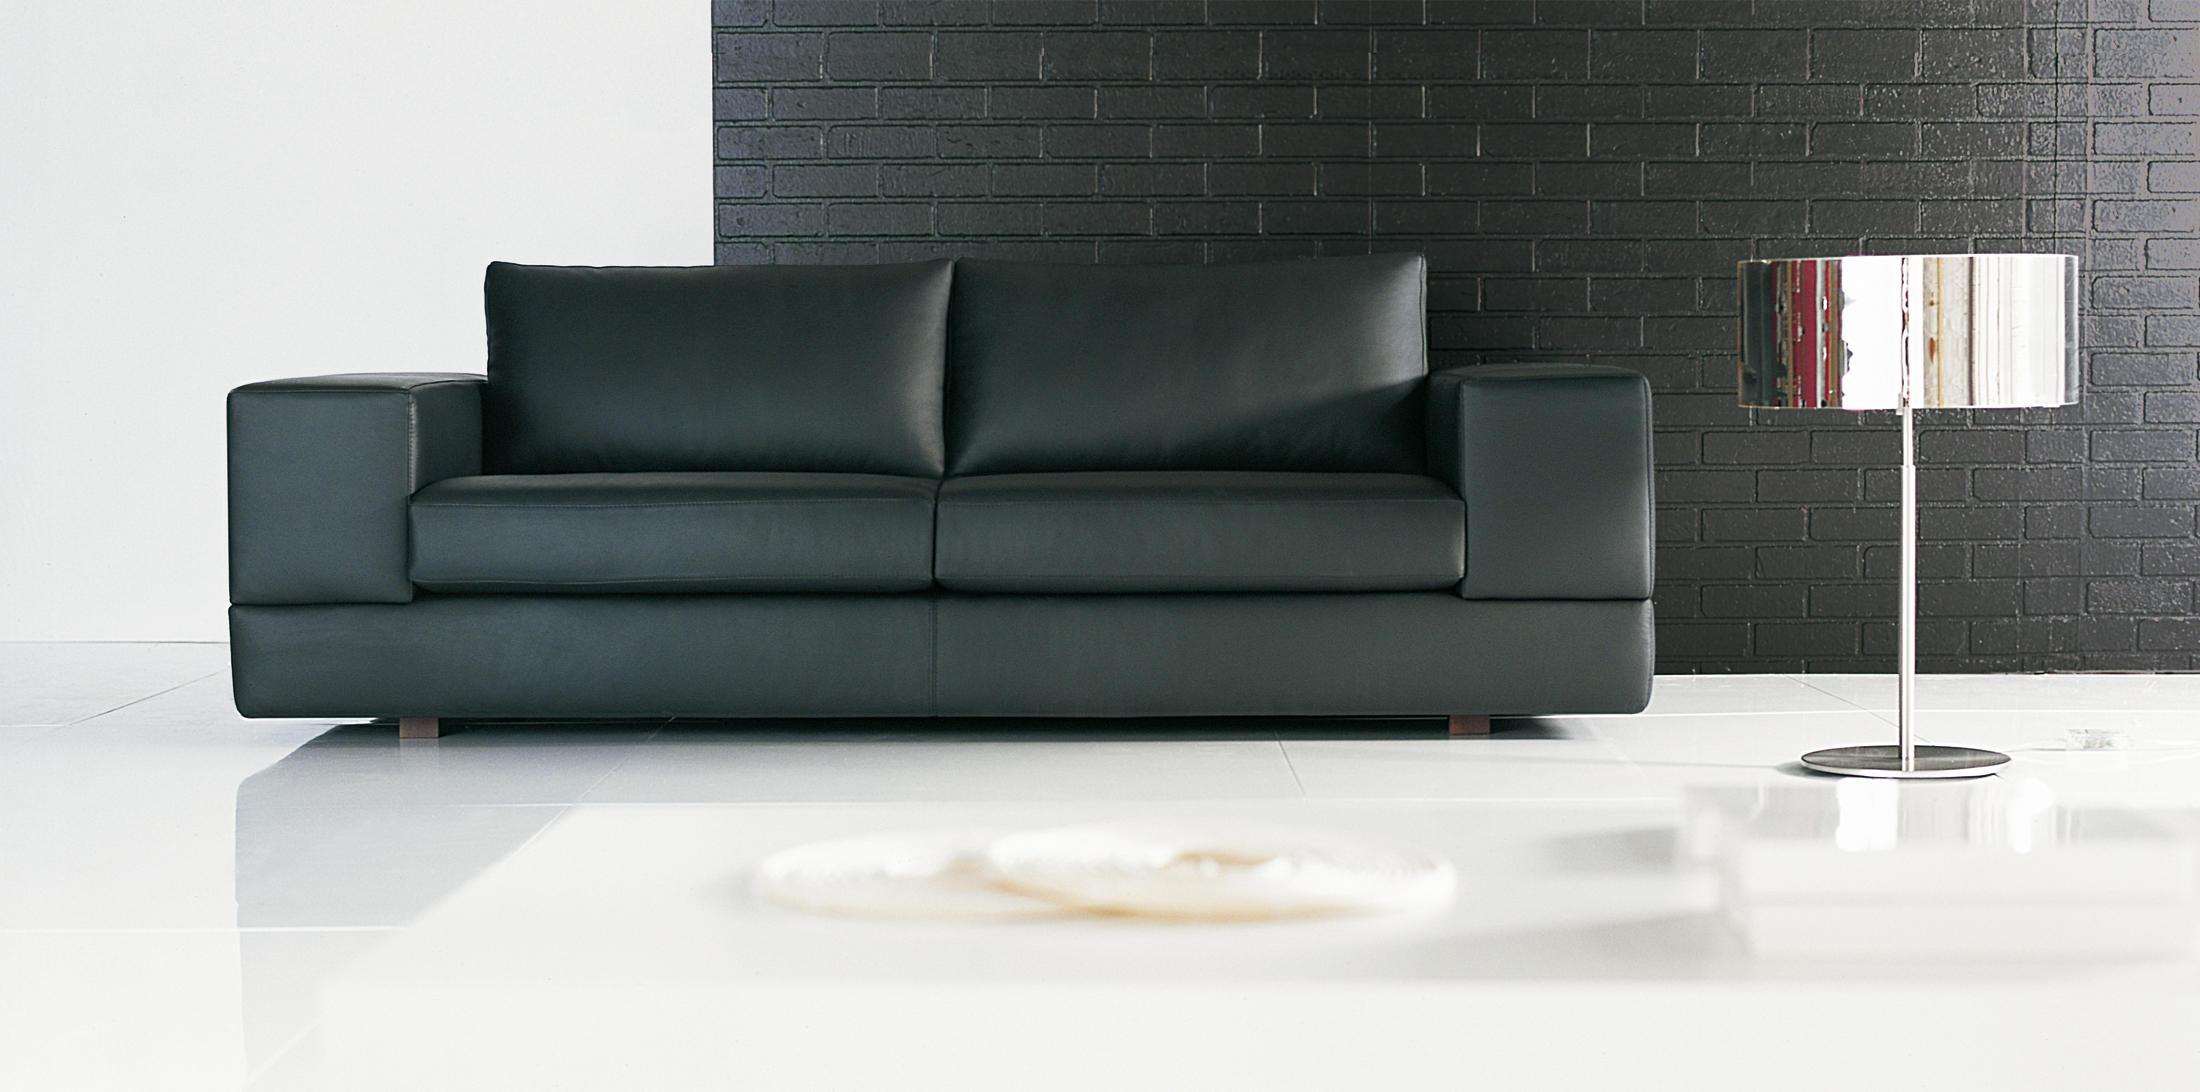 Tolo lounge sofas from rafemar architonic - Rafemar sofas ...